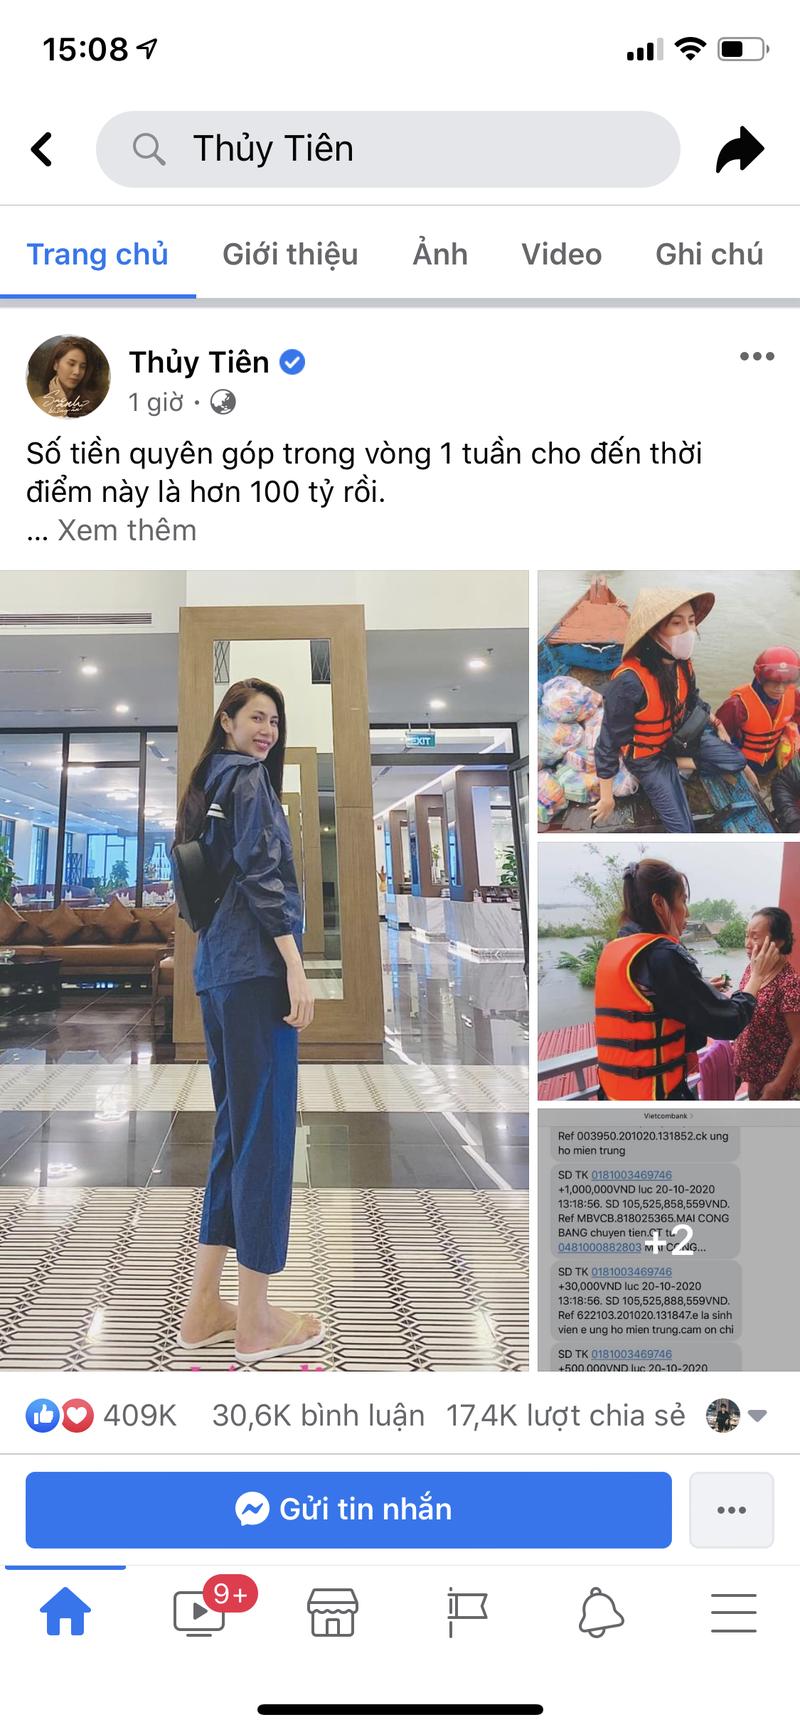 Hinh anh ca si Thuy Tien keu goi duoc 100 ty dong, lao vao lu du cuu tro dong bao